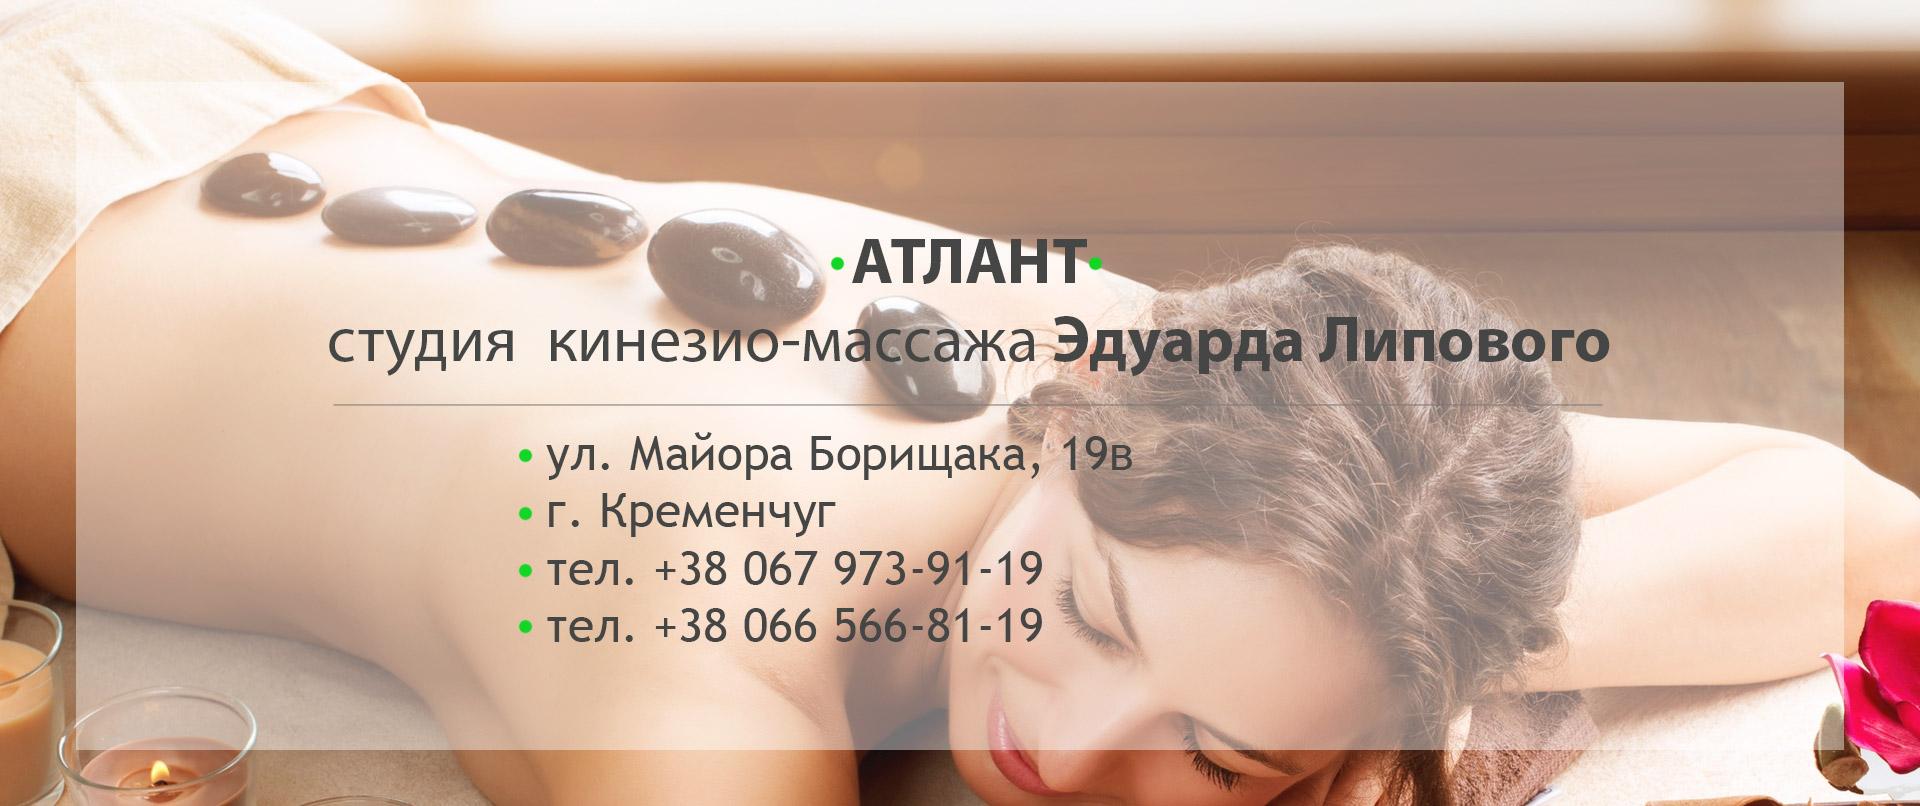 title_61789bfb2df6311525640541635294203